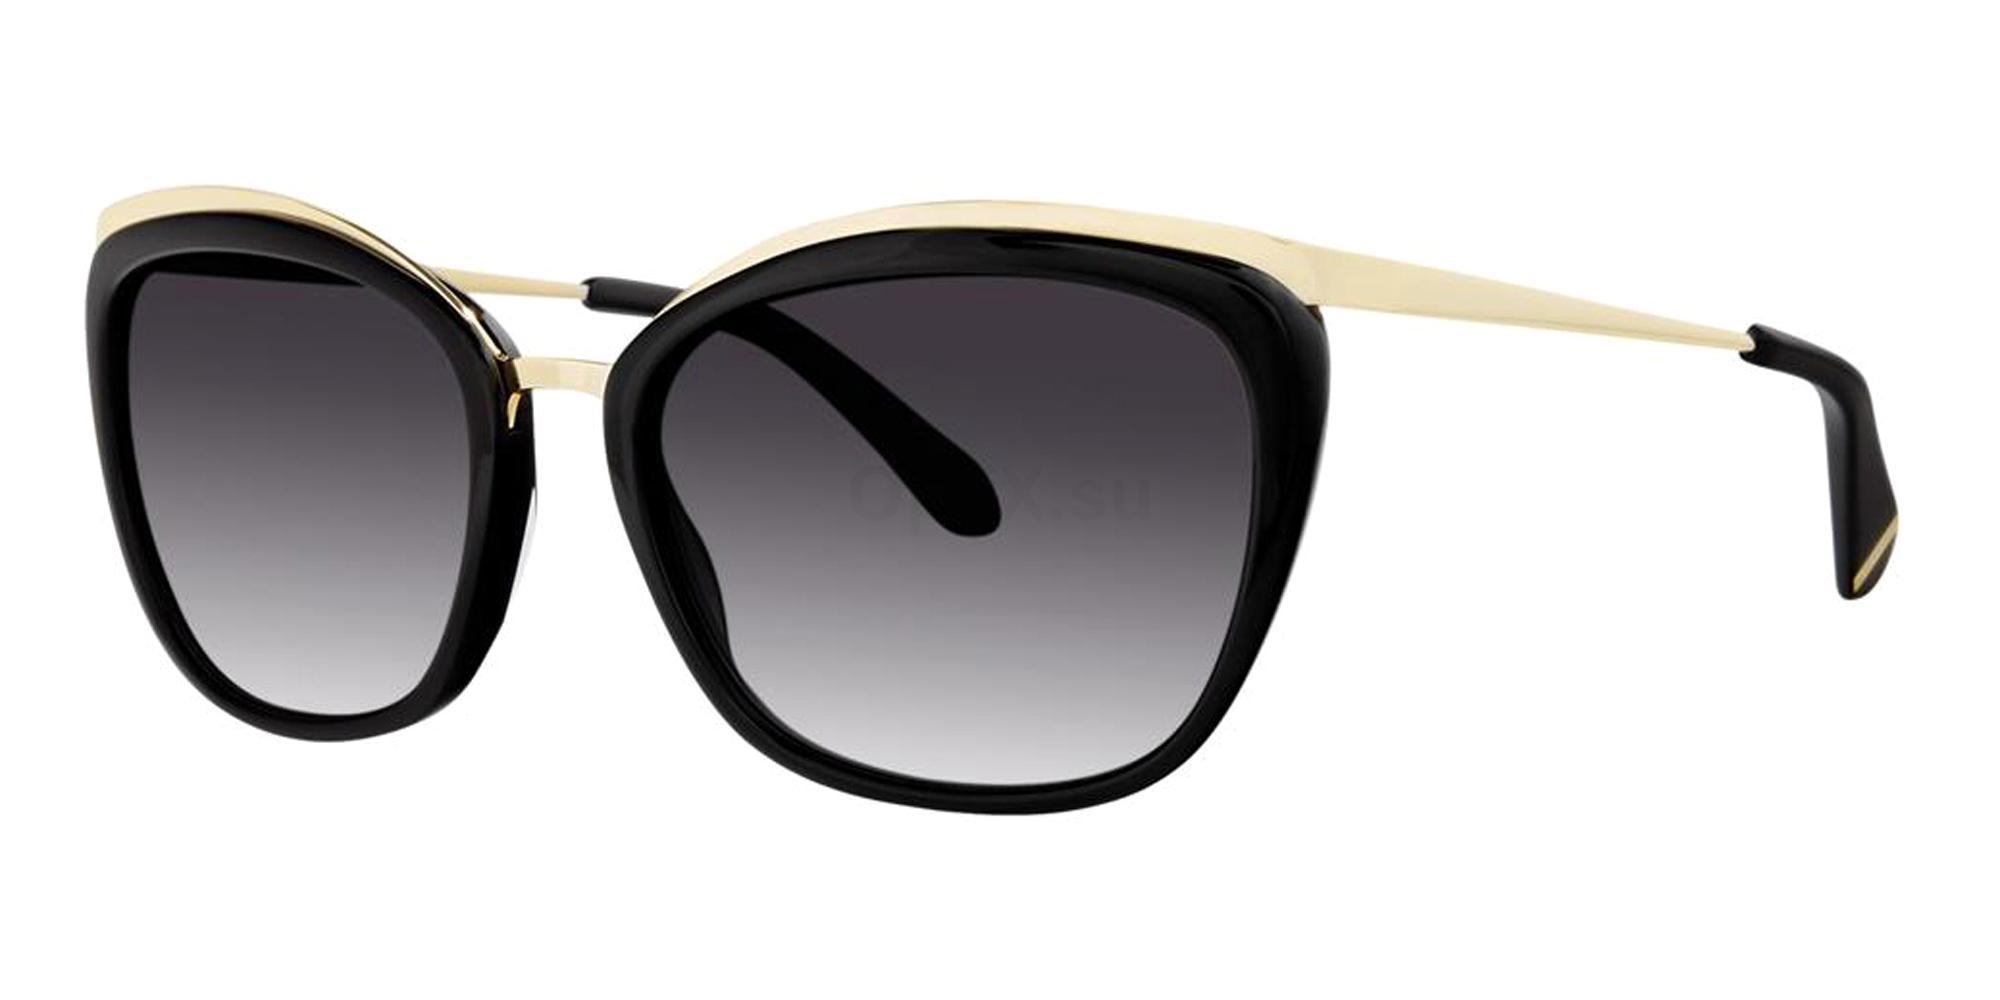 Black JAYNE Sunglasses, Zac Posen